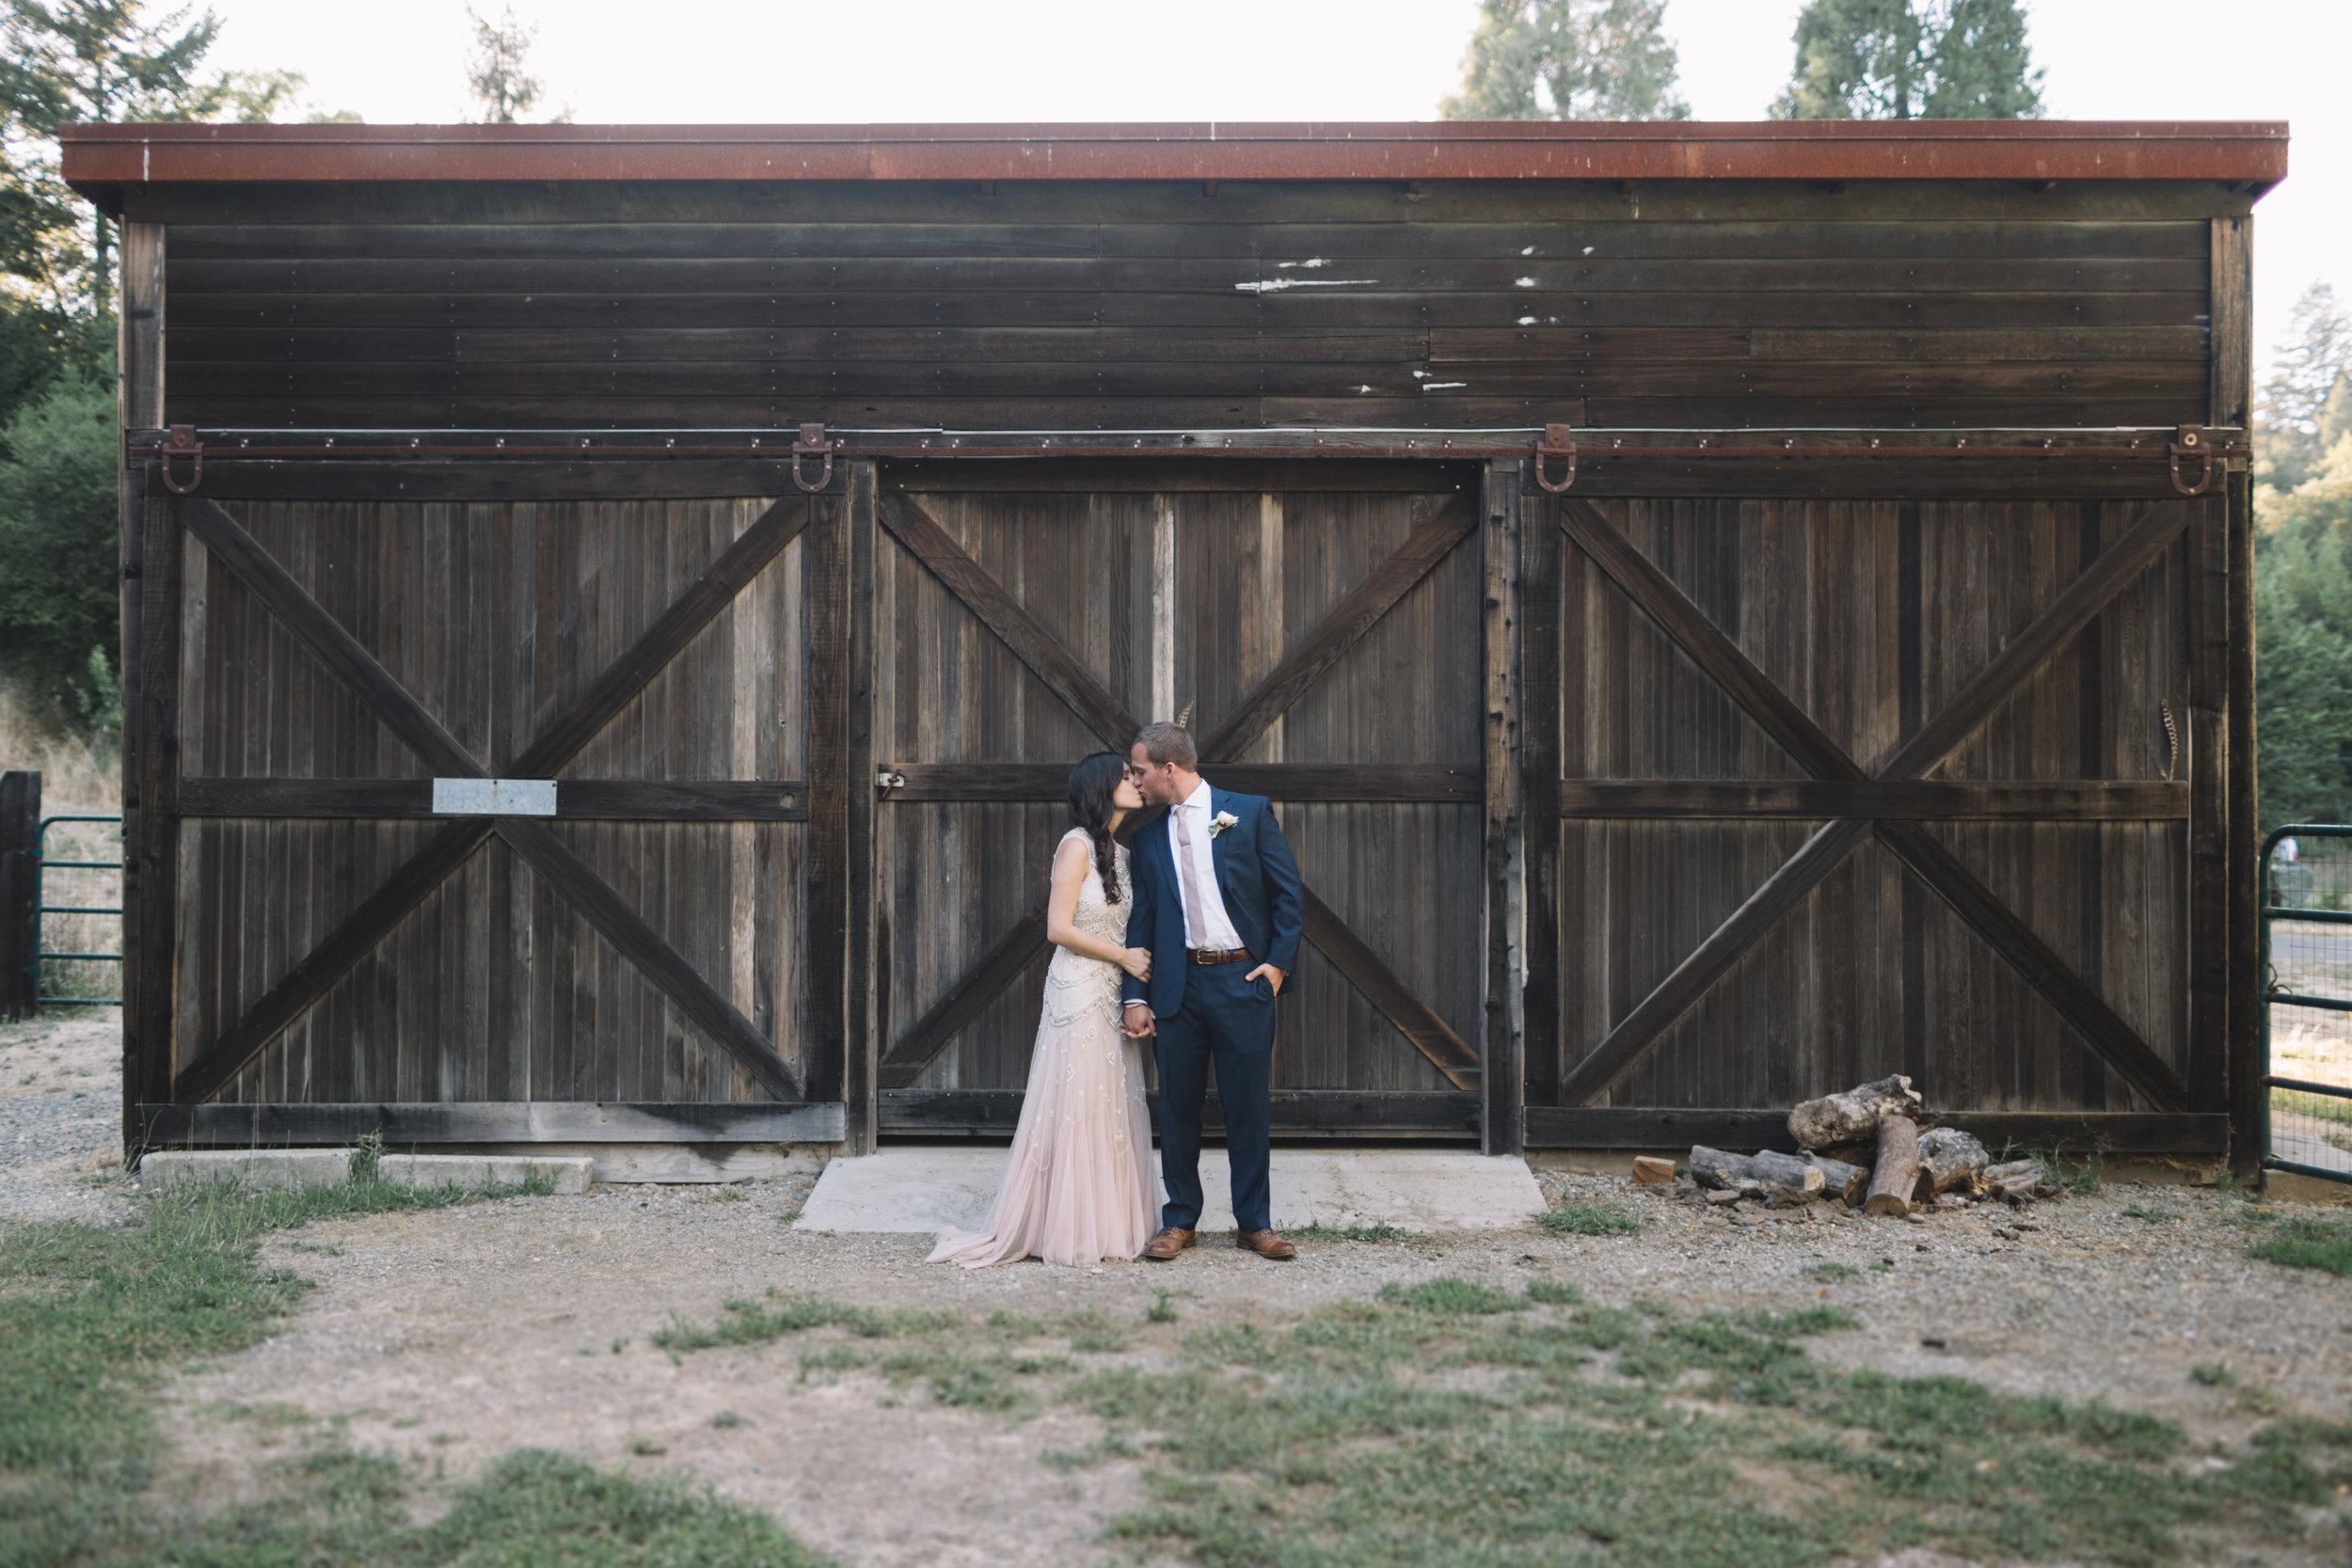 LishaWangPhotography_Carly_Matt_Wedding-183.jpg